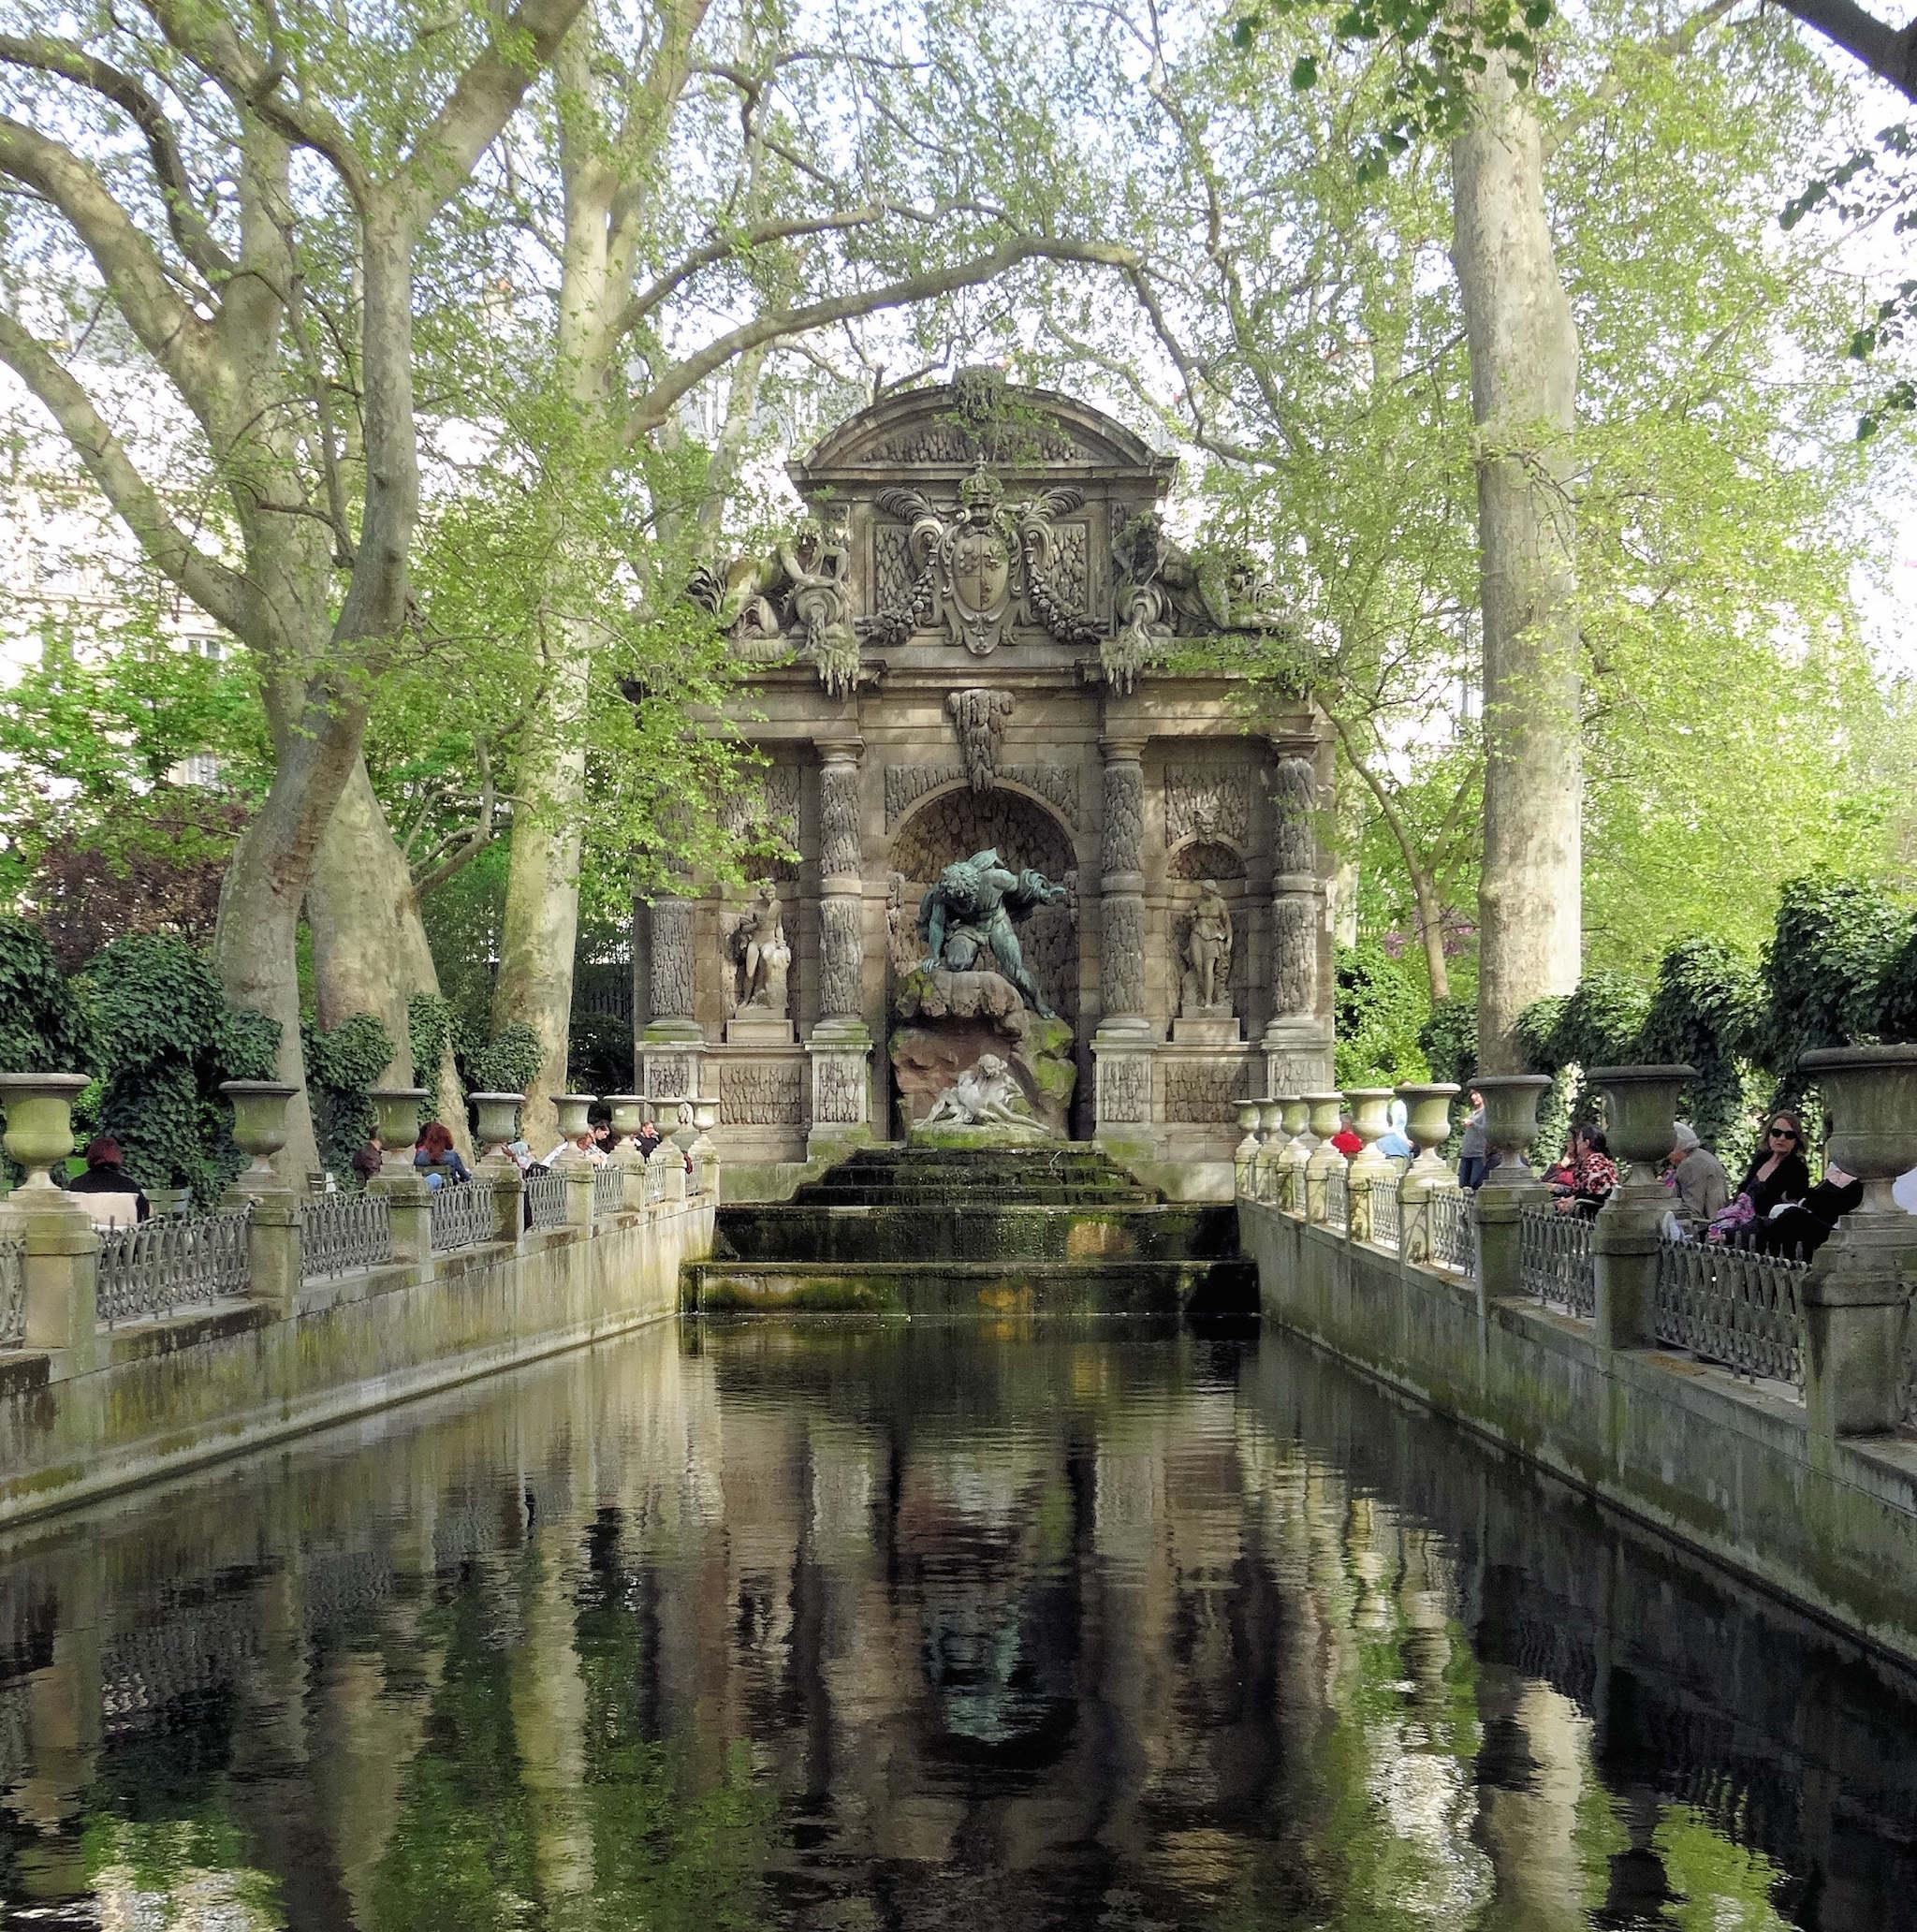 Ligne kleinbettingen luxembourg gardens ante post betting ladbrokes 49s